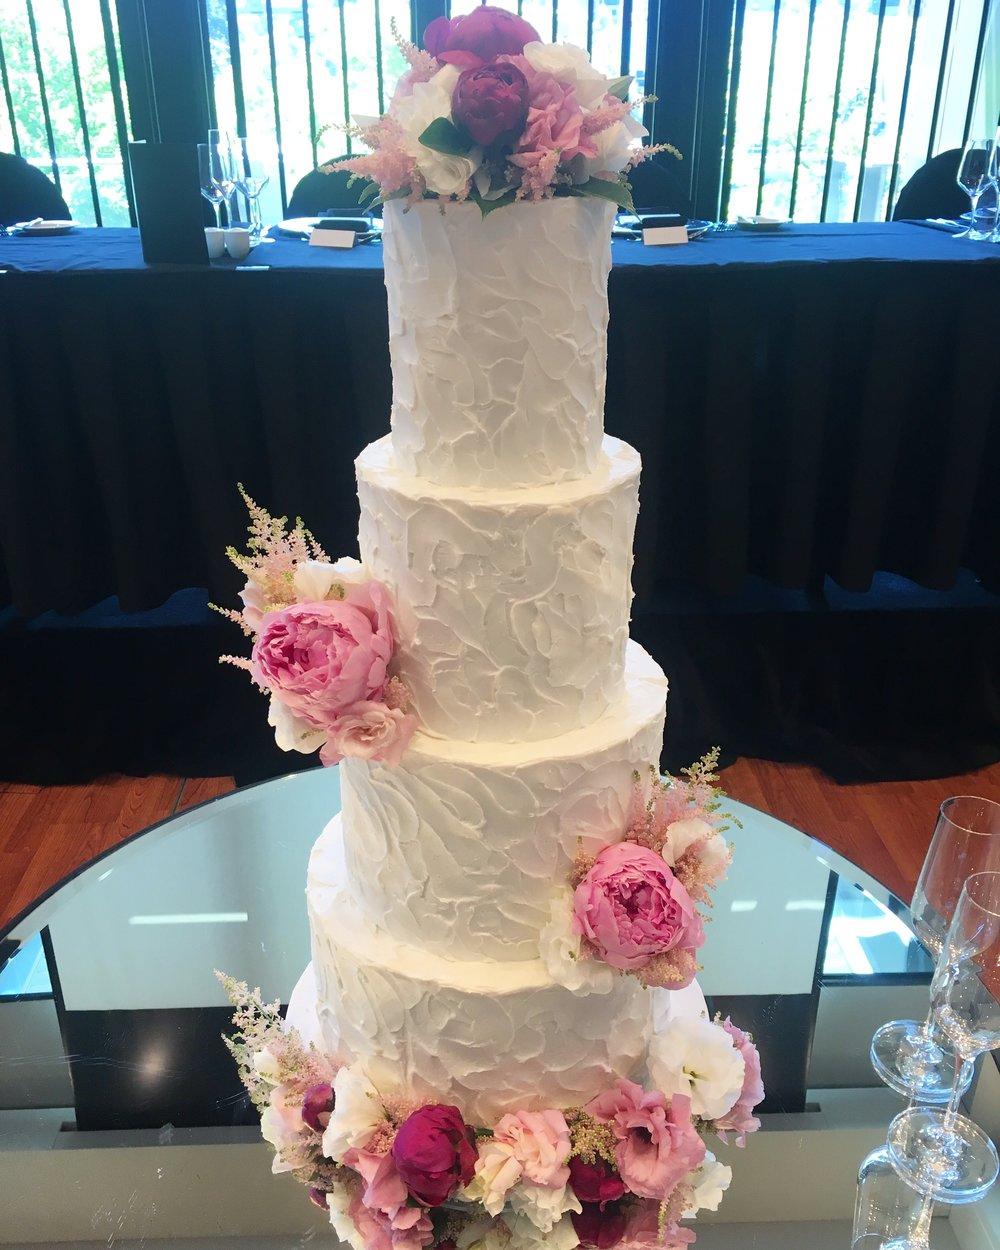 Copy of Buttercream Wedding Cake with Fresh Flowers